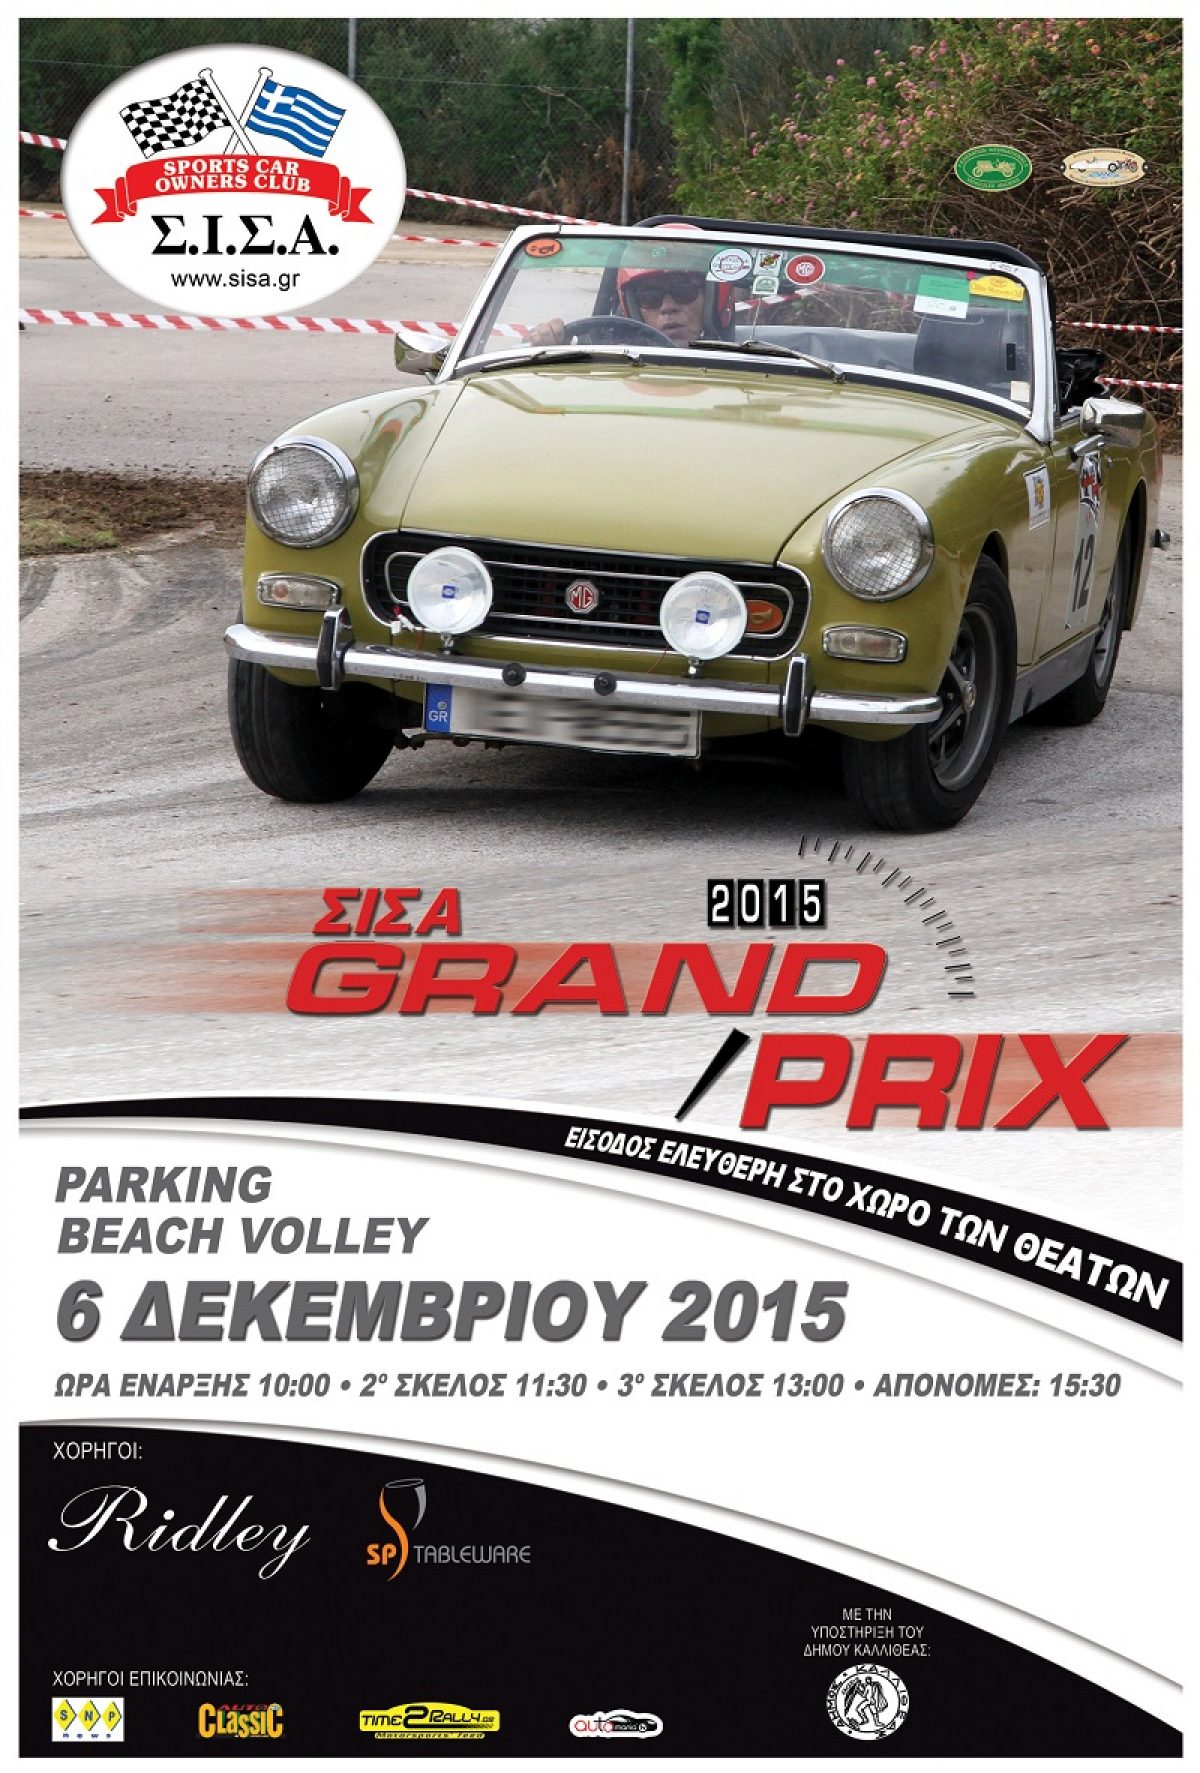 Regularity: ΣΙΣΑ Grand Prix 2015